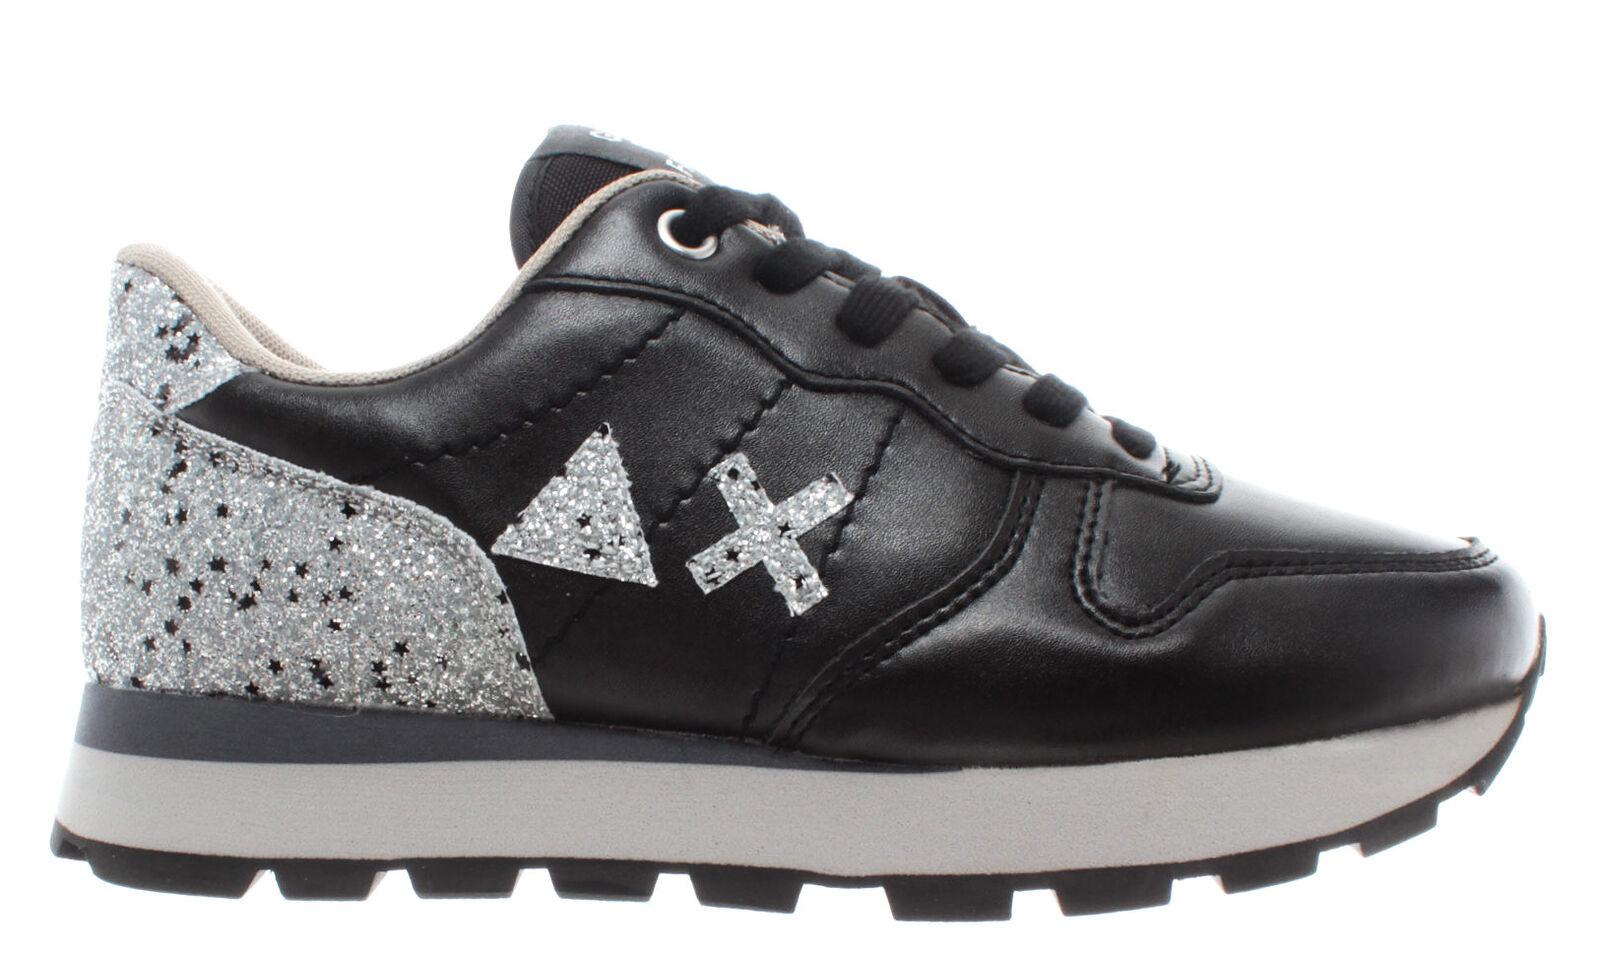 zapatillas mujer sun68 z29205 running Ally glitter negro leather